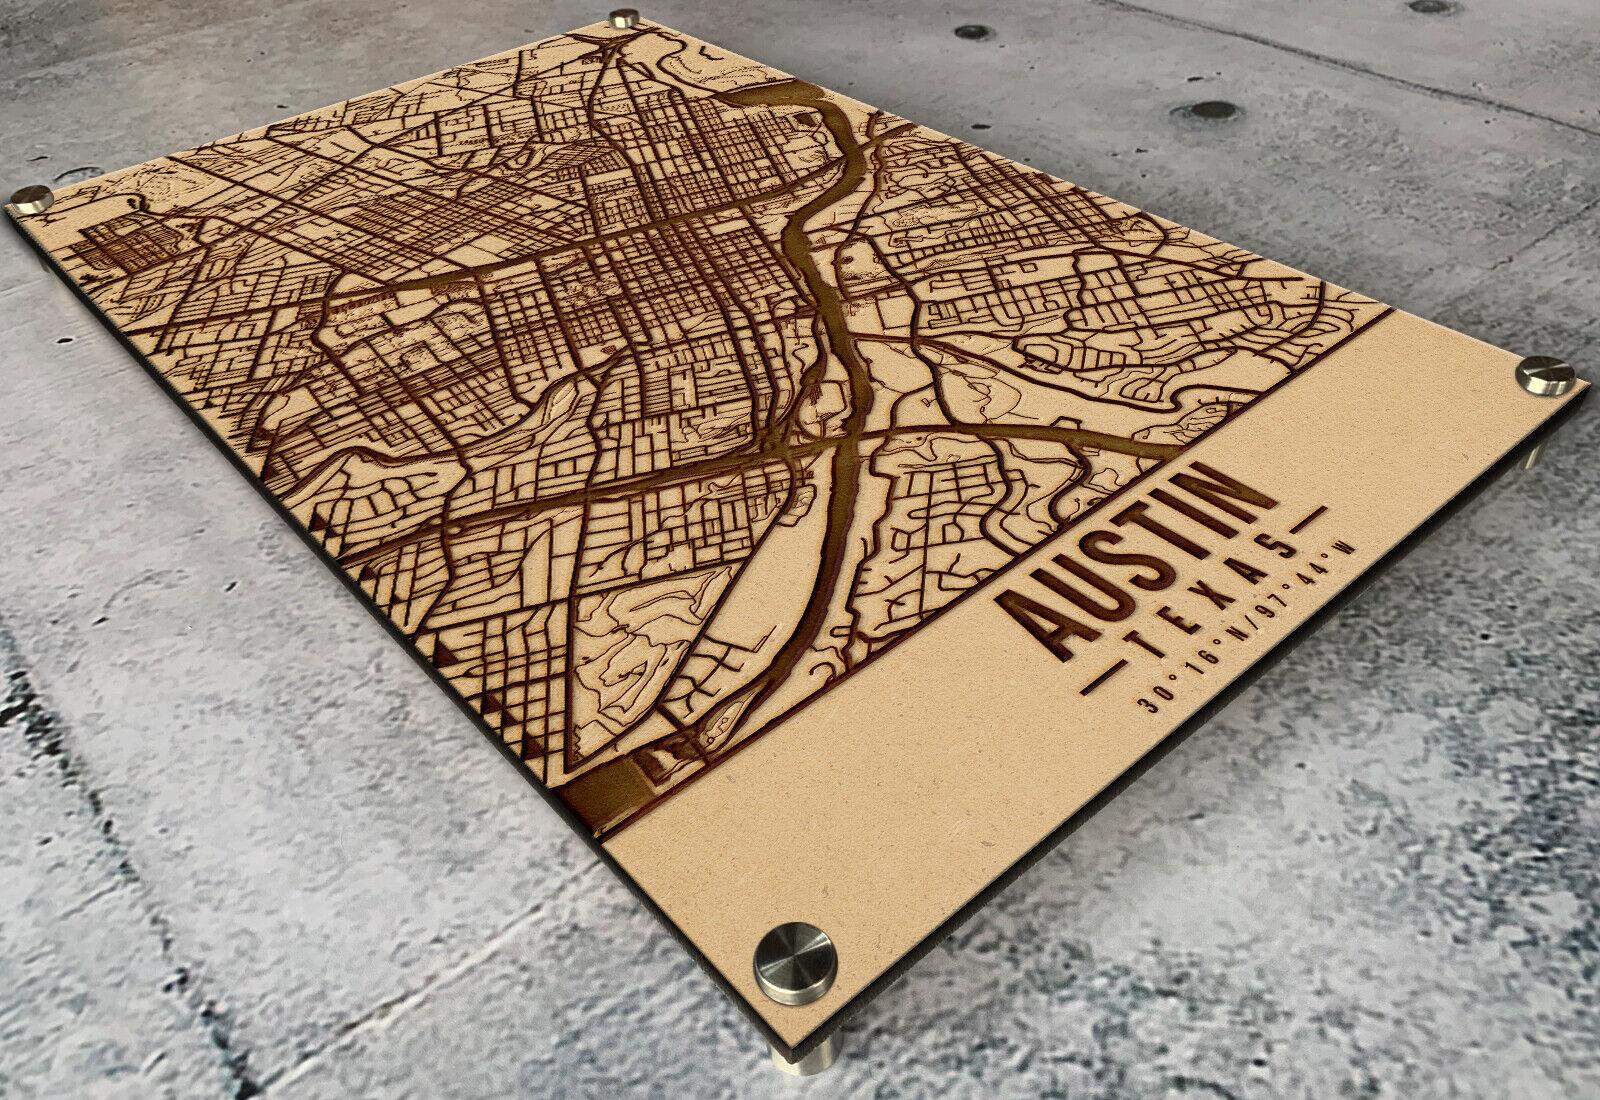 Laser Engraved Austin Map Etched on 1 2  Wood - TX Stadt Straße Home Decor Texas